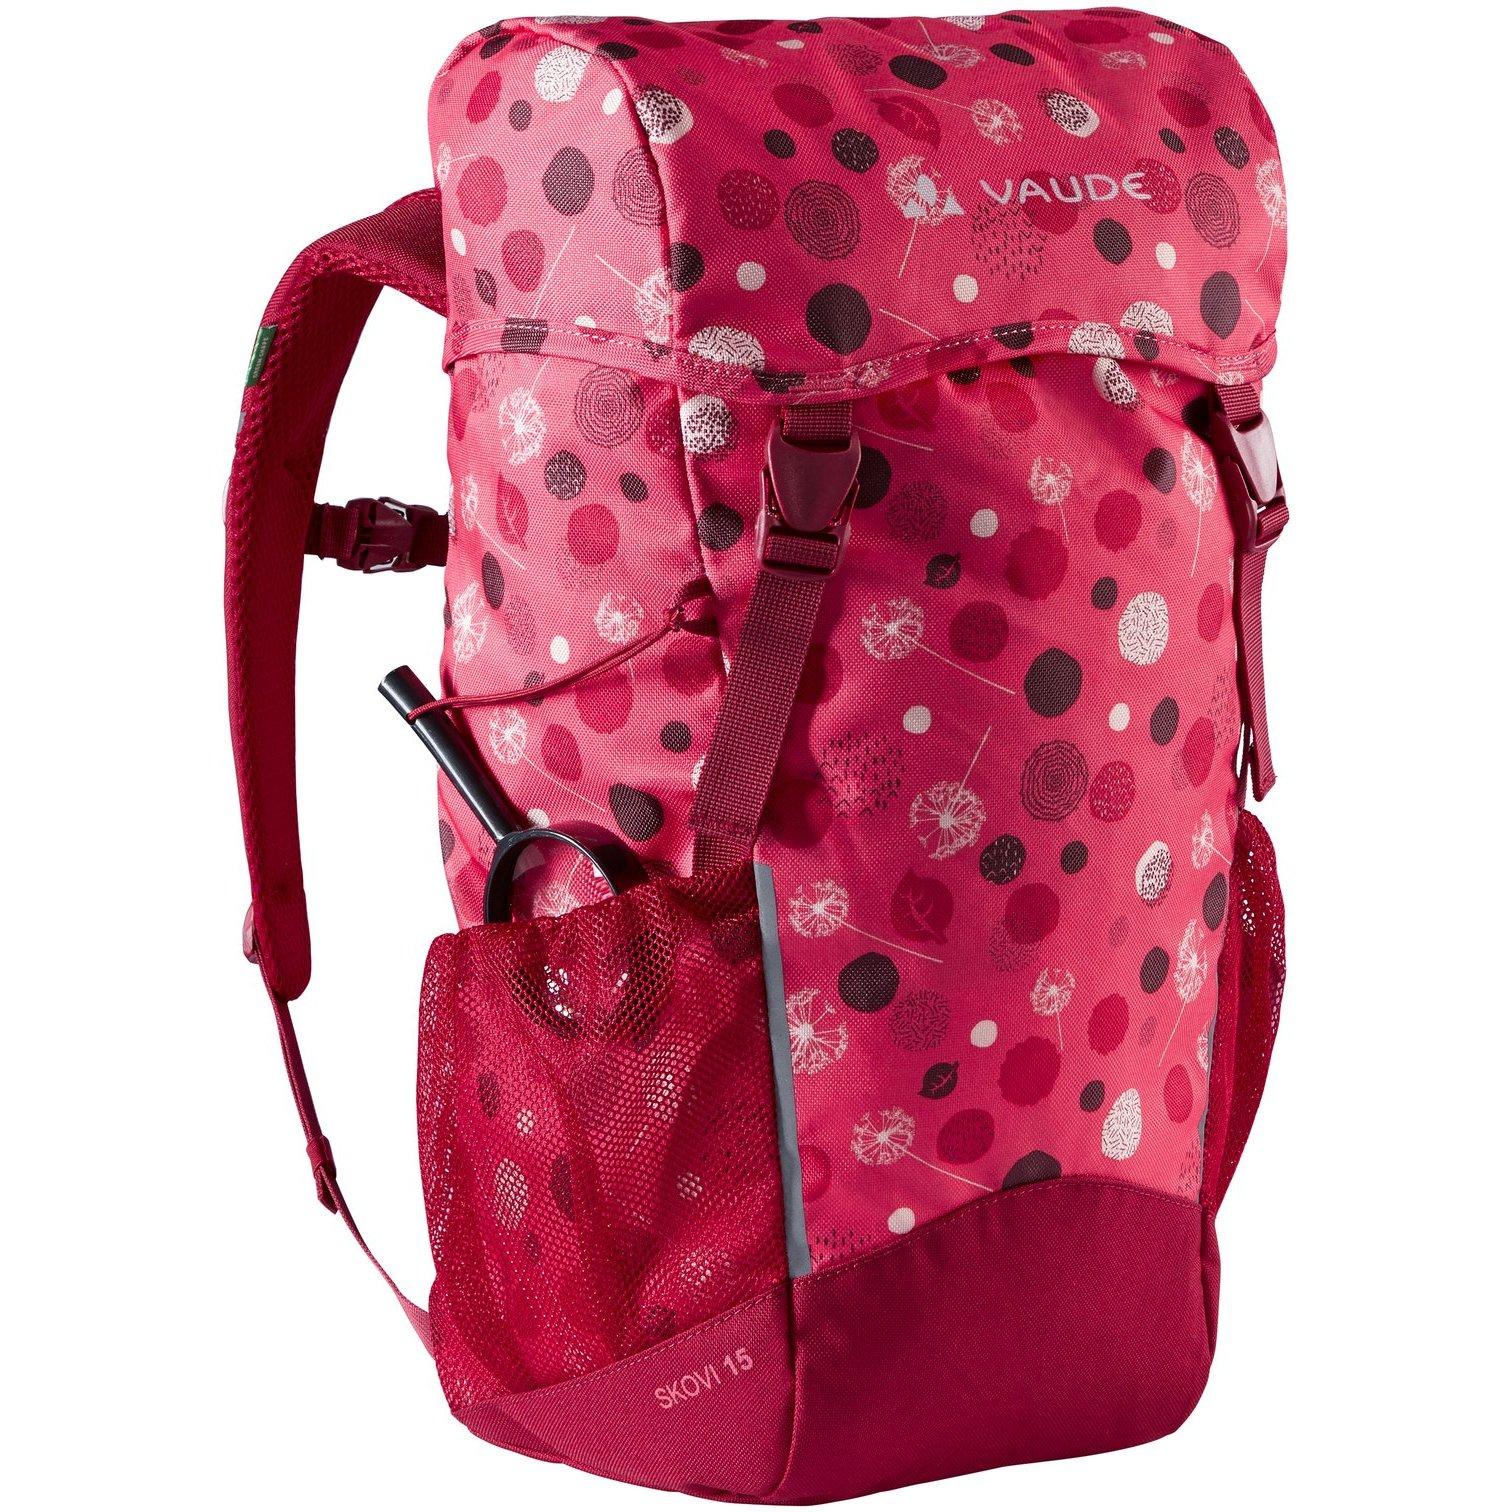 Vaude Skovi 15 Backpack - bright pink/cranberry